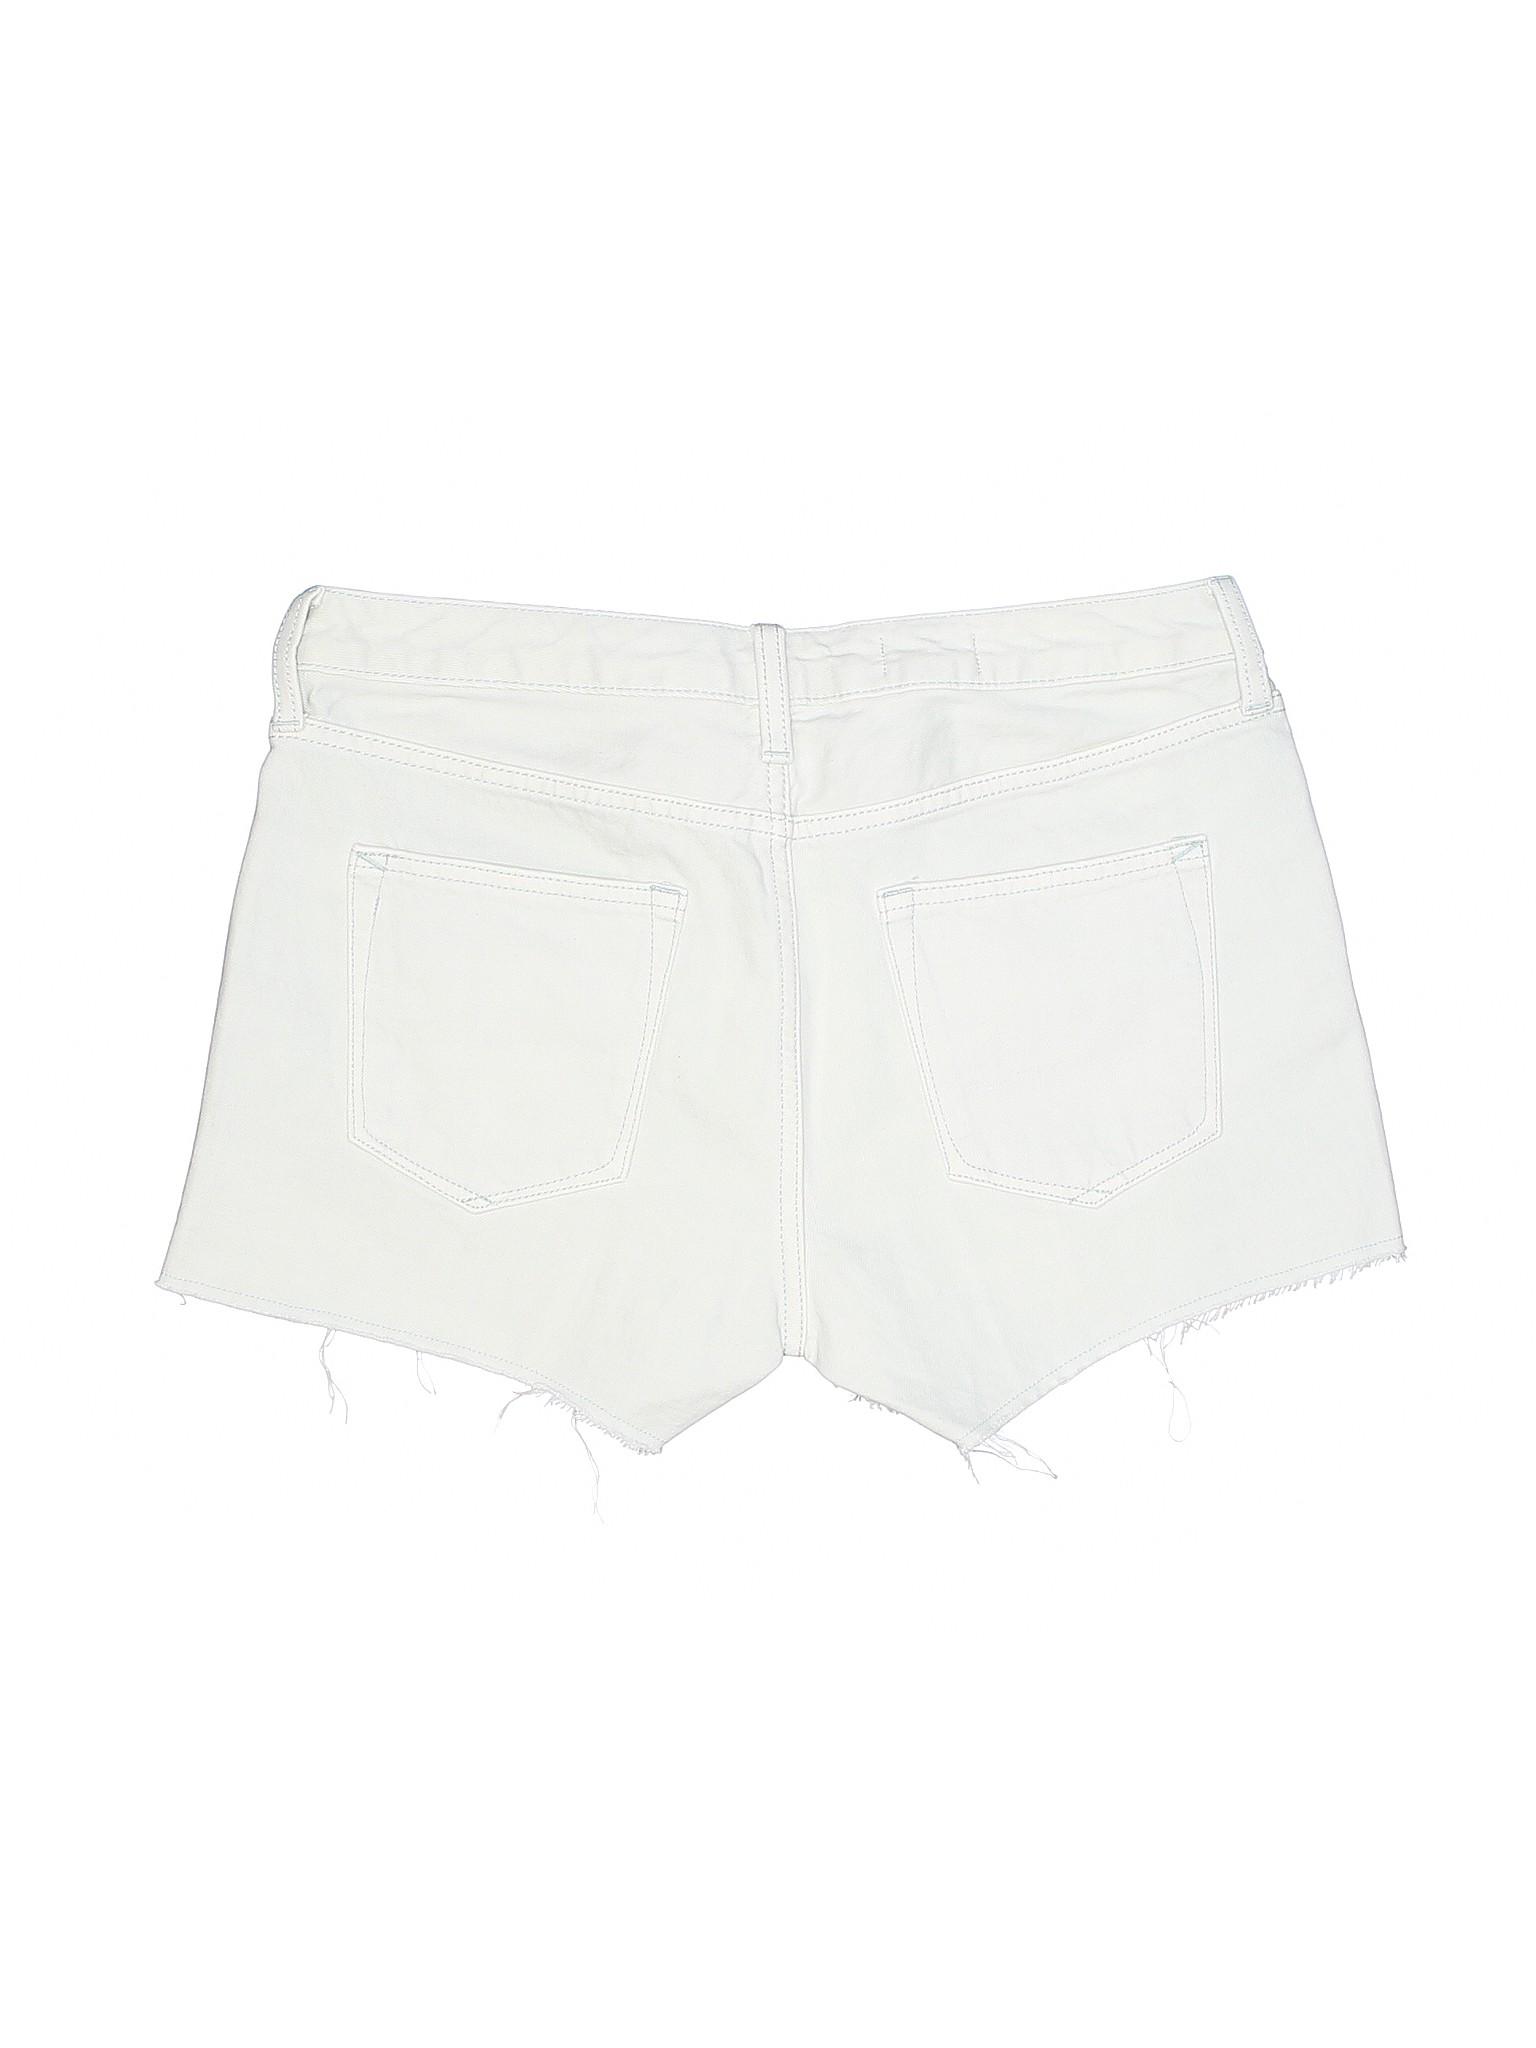 Denim Shorts Denim Boutique Shorts Boutique Gap Gap Z8qaw6wE